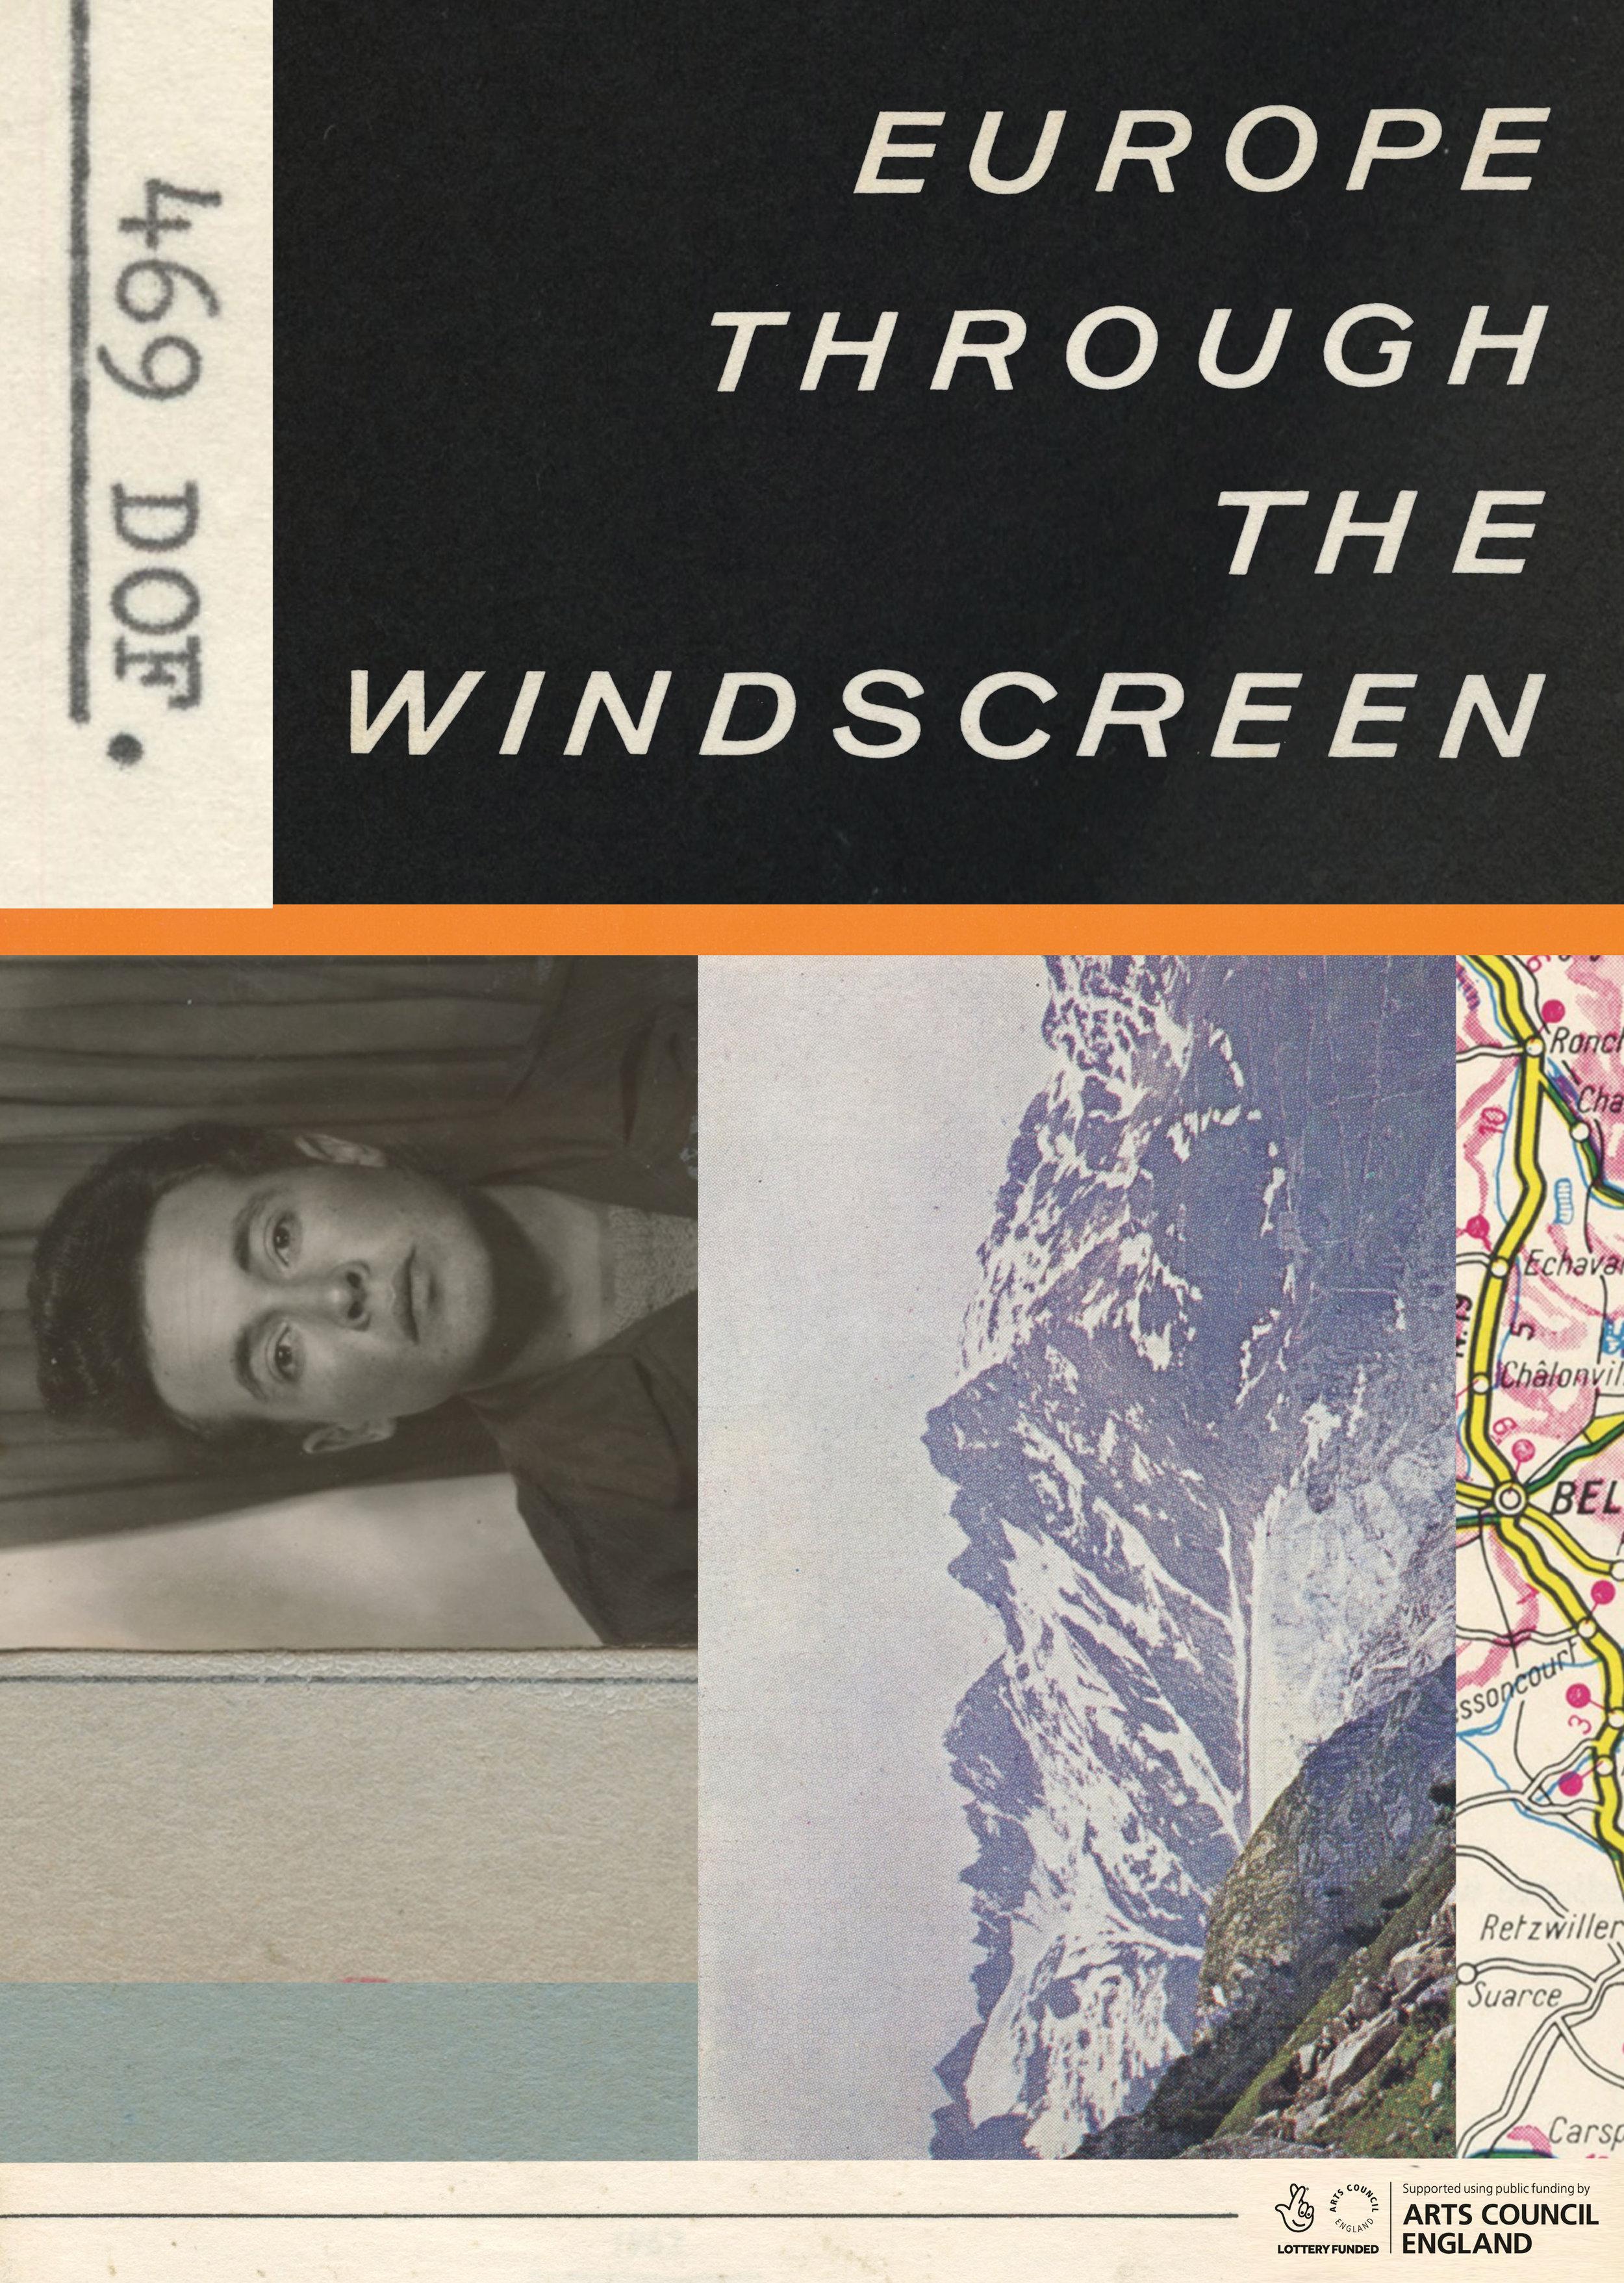 469 DOF - Europe Through The Windscreen